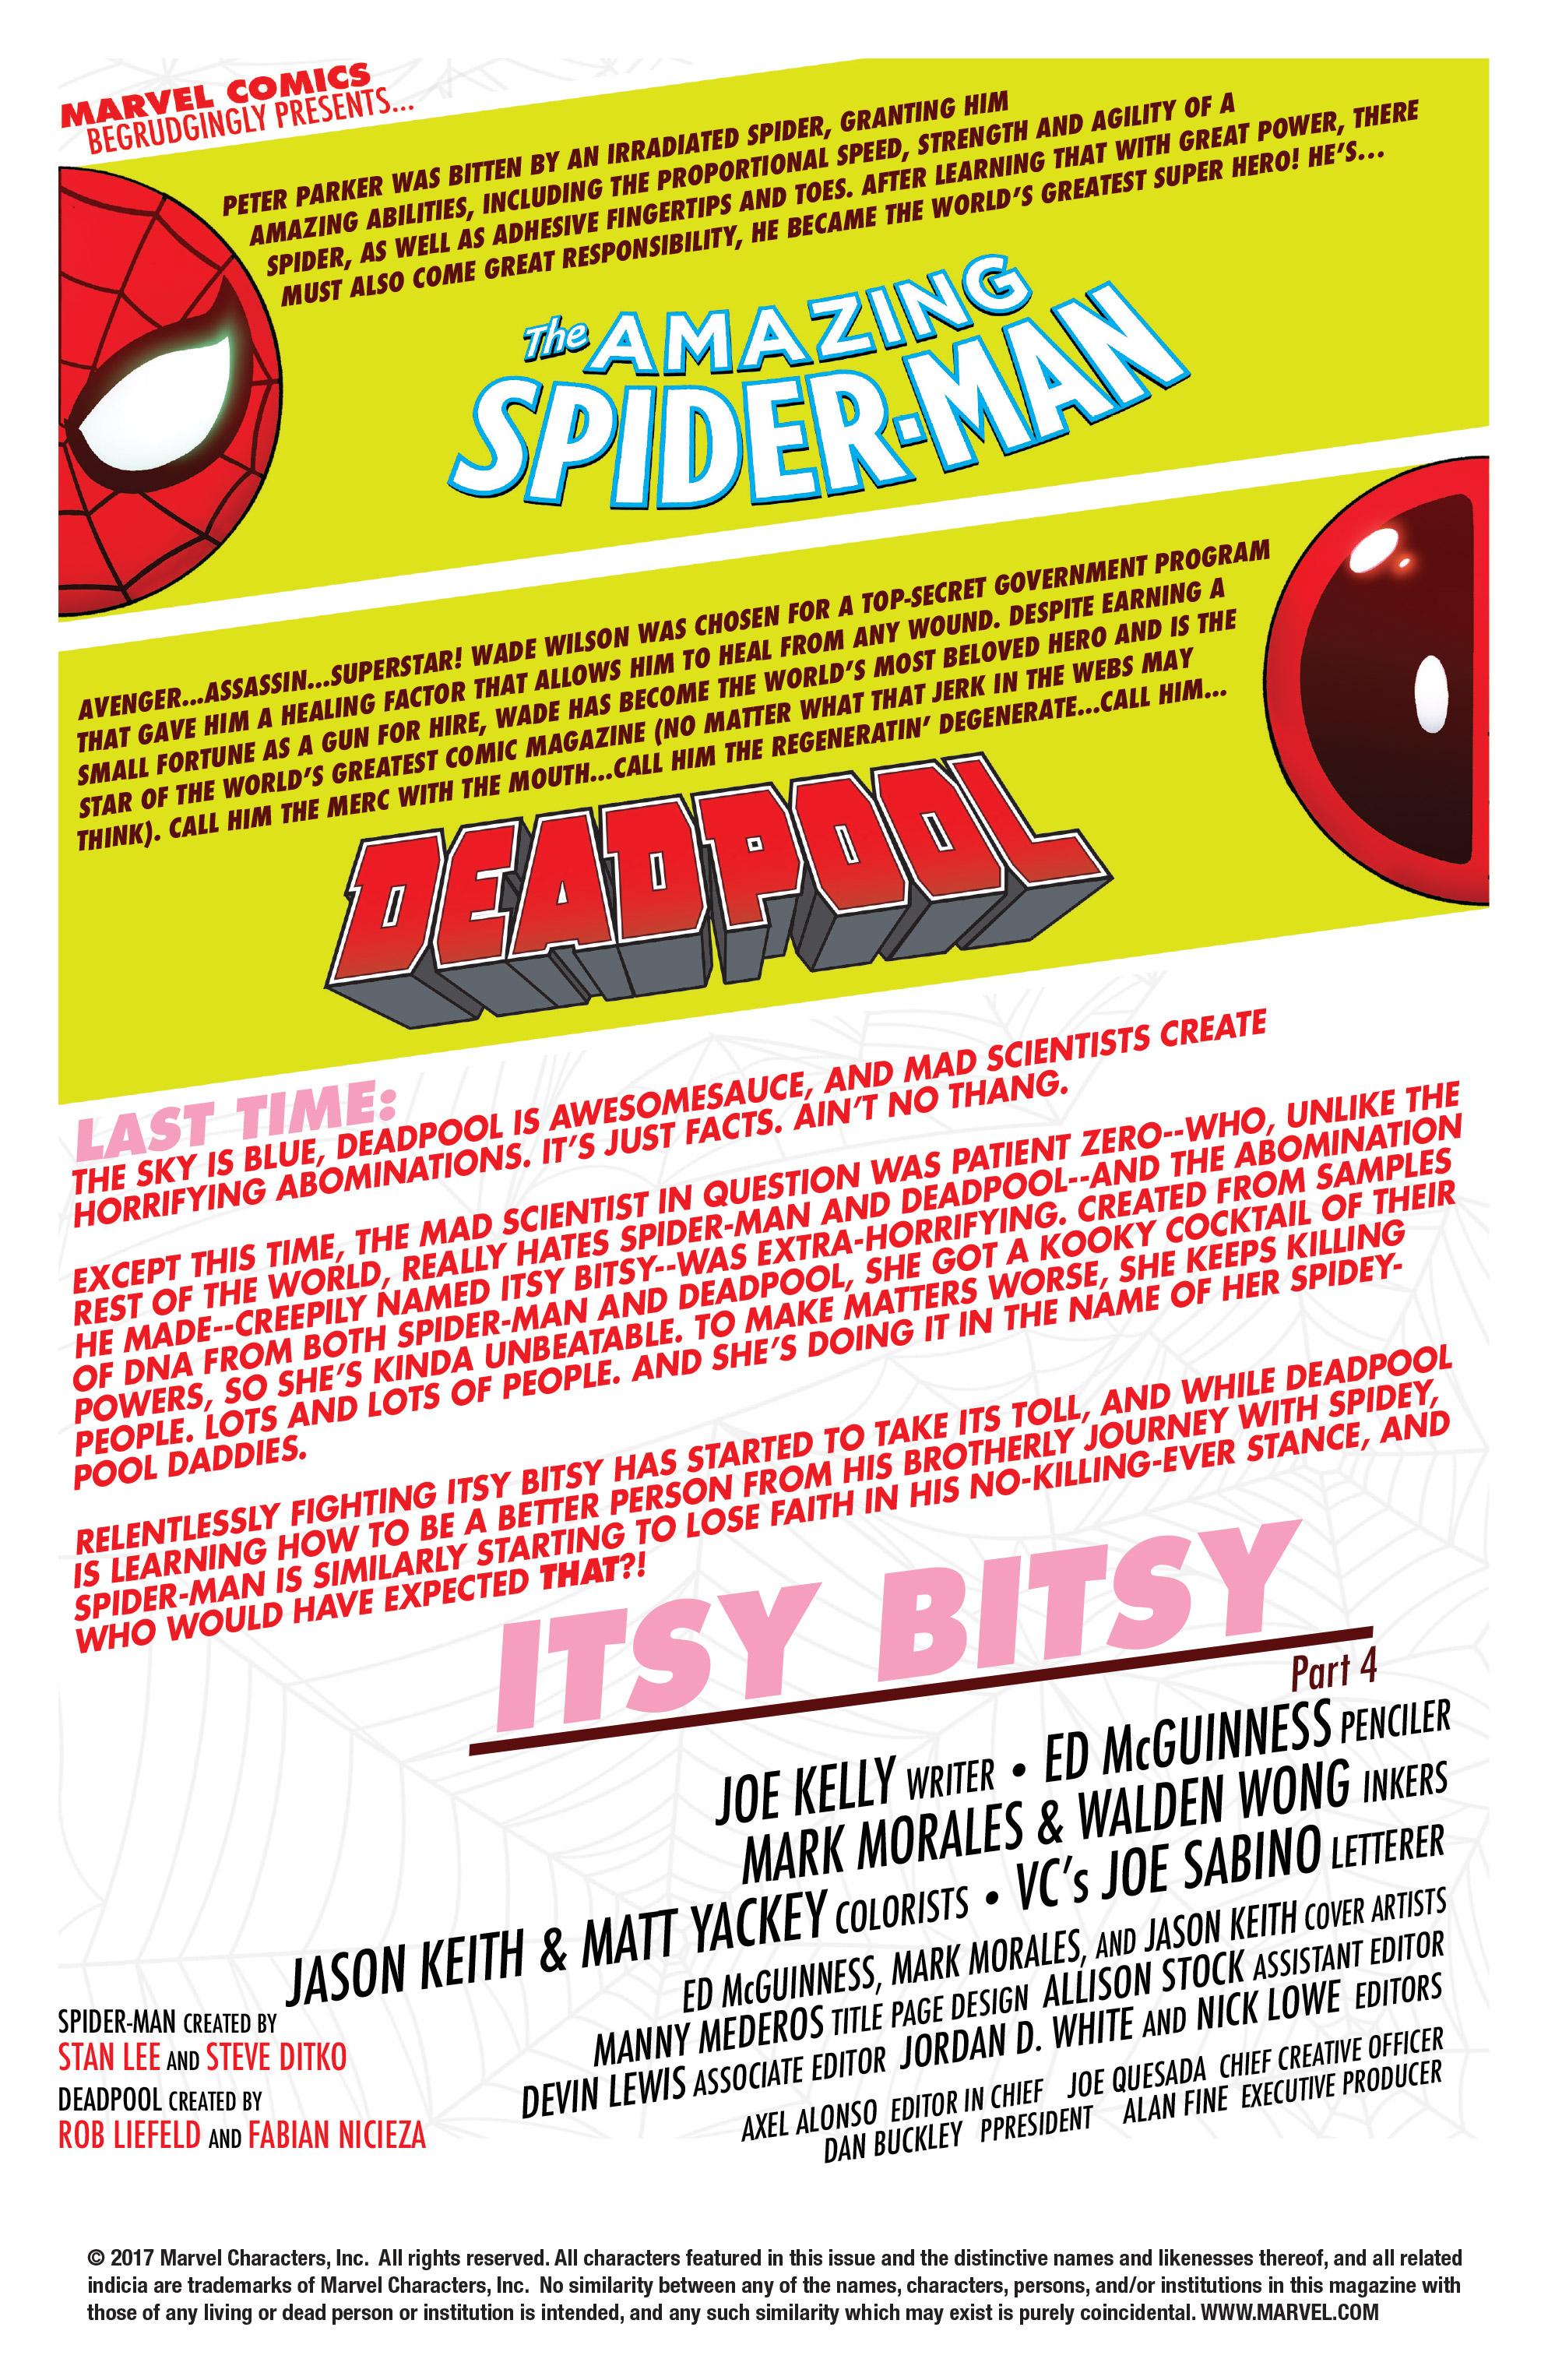 Read online Spider-Man/Deadpool comic -  Issue #17 - 2